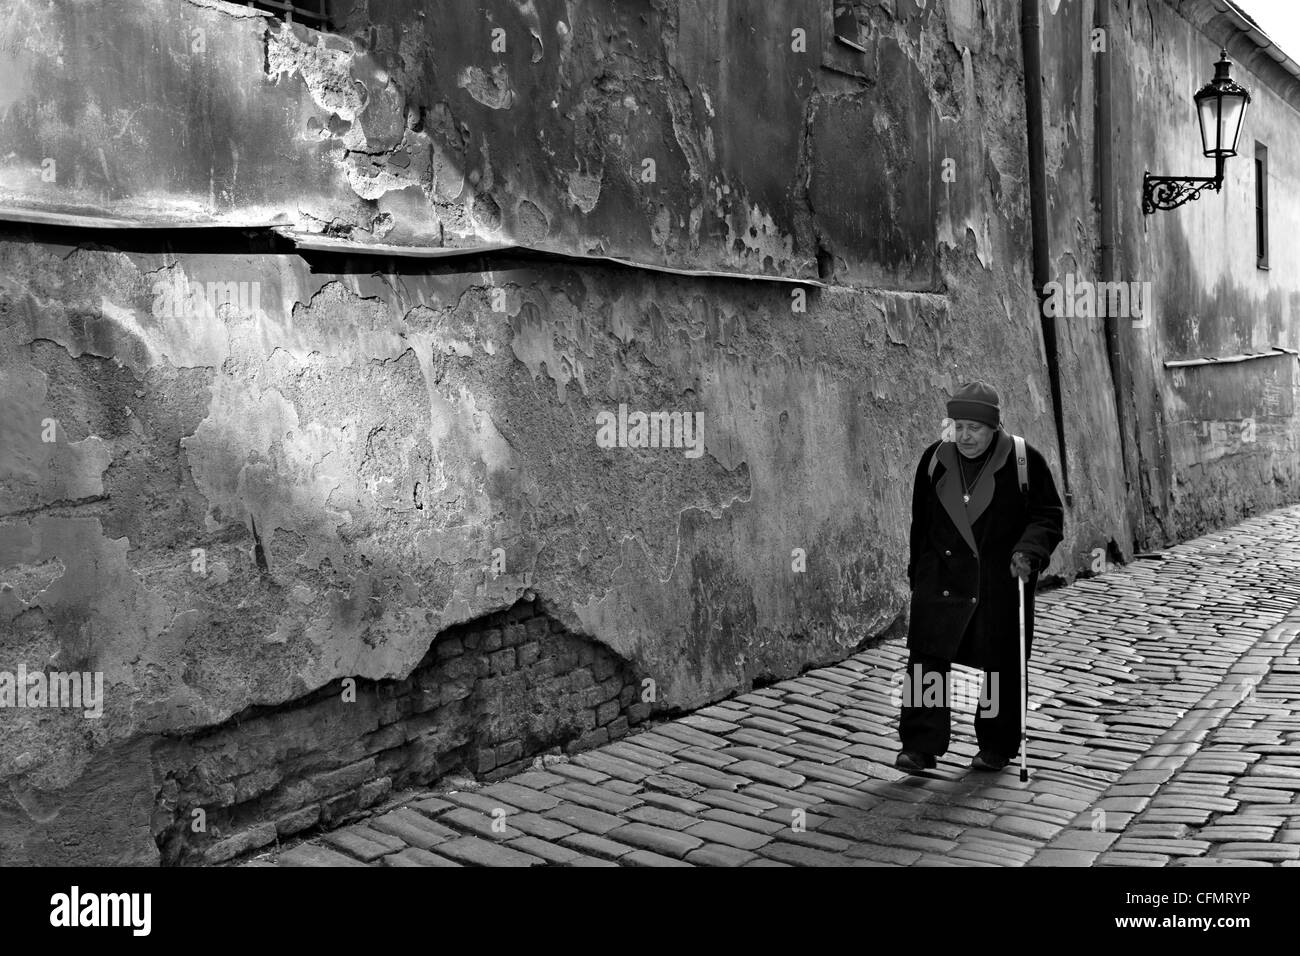 Elderly lady with walking stick at Saská, Little Quarter, Prague, Czech Republic - Stock Image